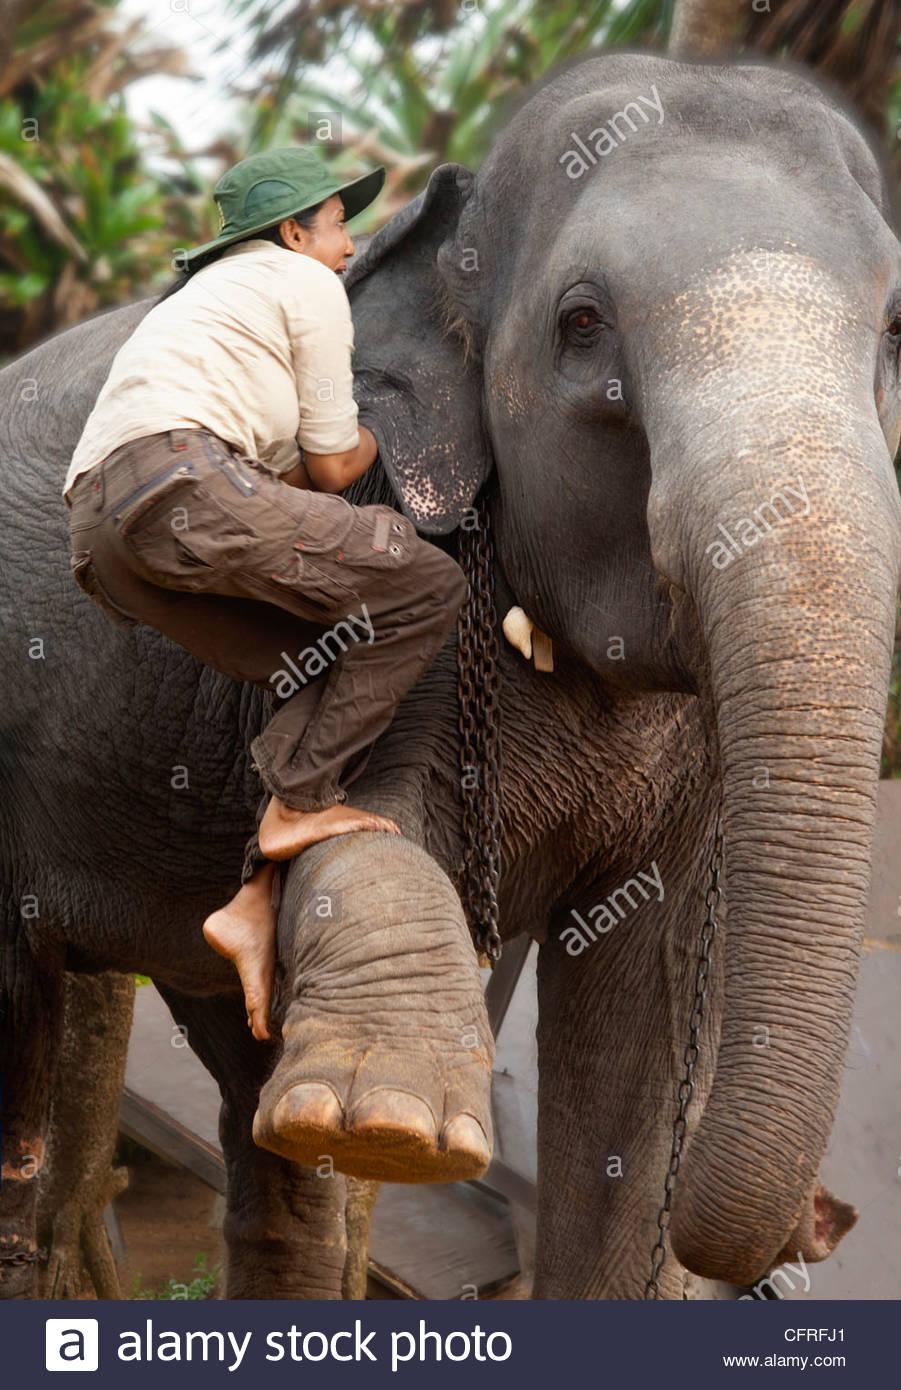 Sri Lankan woman climbing up an Asian elephant, Sri Lanka, Asia - Stock Image